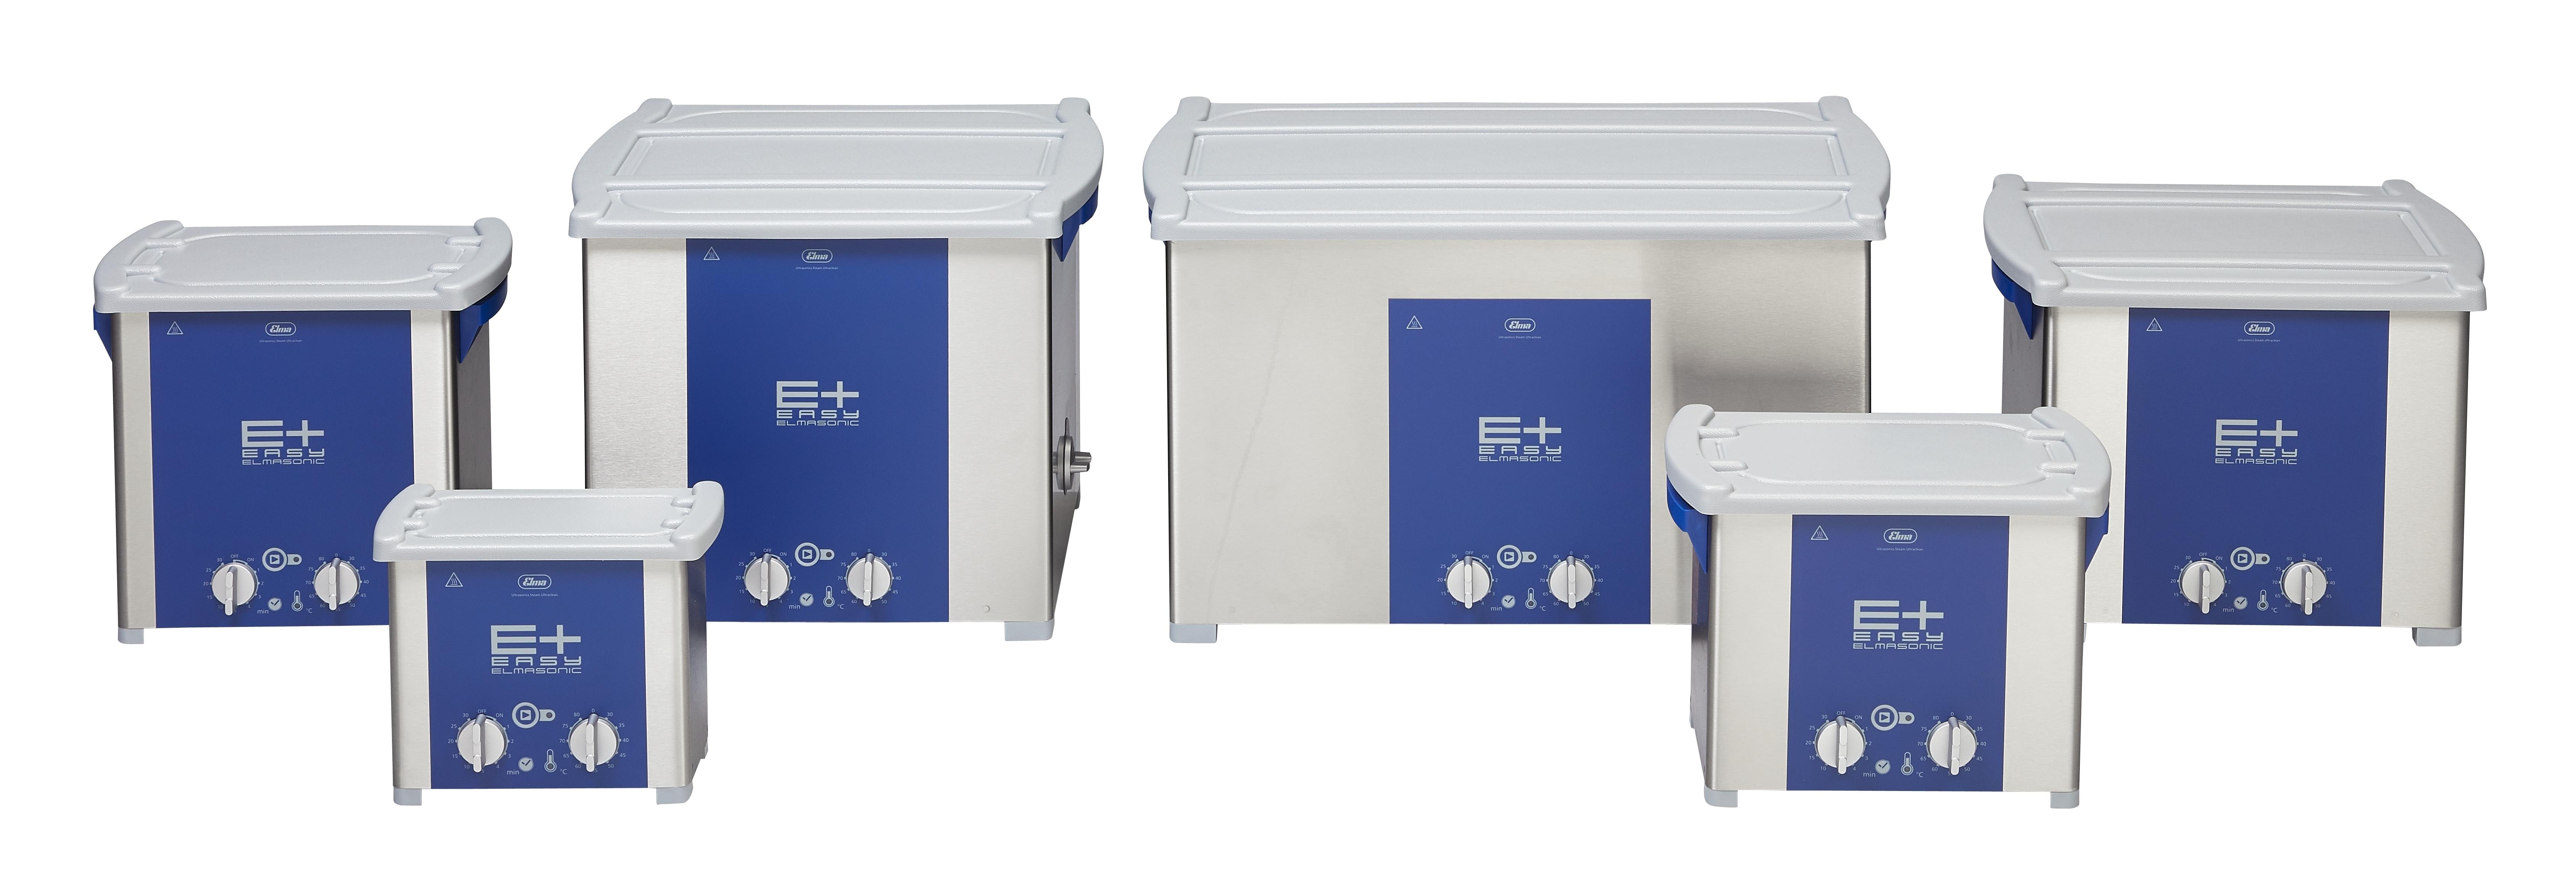 New Elmasonic E Plus Ultrasonic Cleaners (Photo: Business Wire)